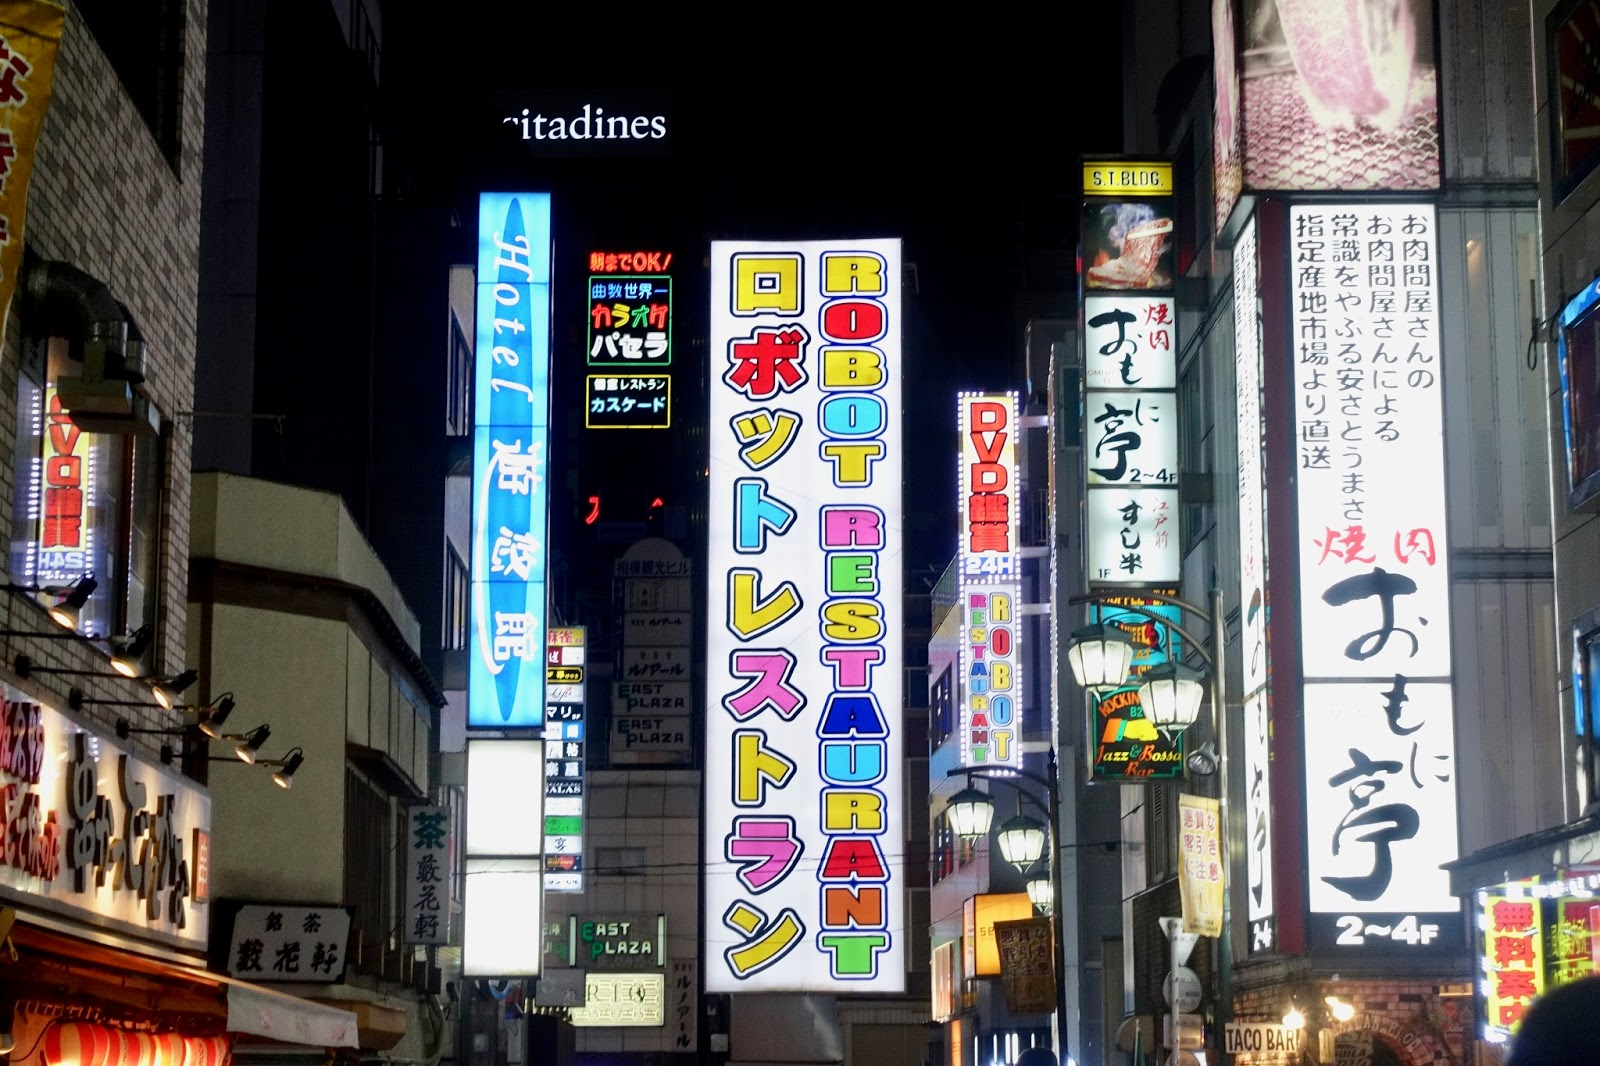 SHINJUKU AT NIGHT JAPAN